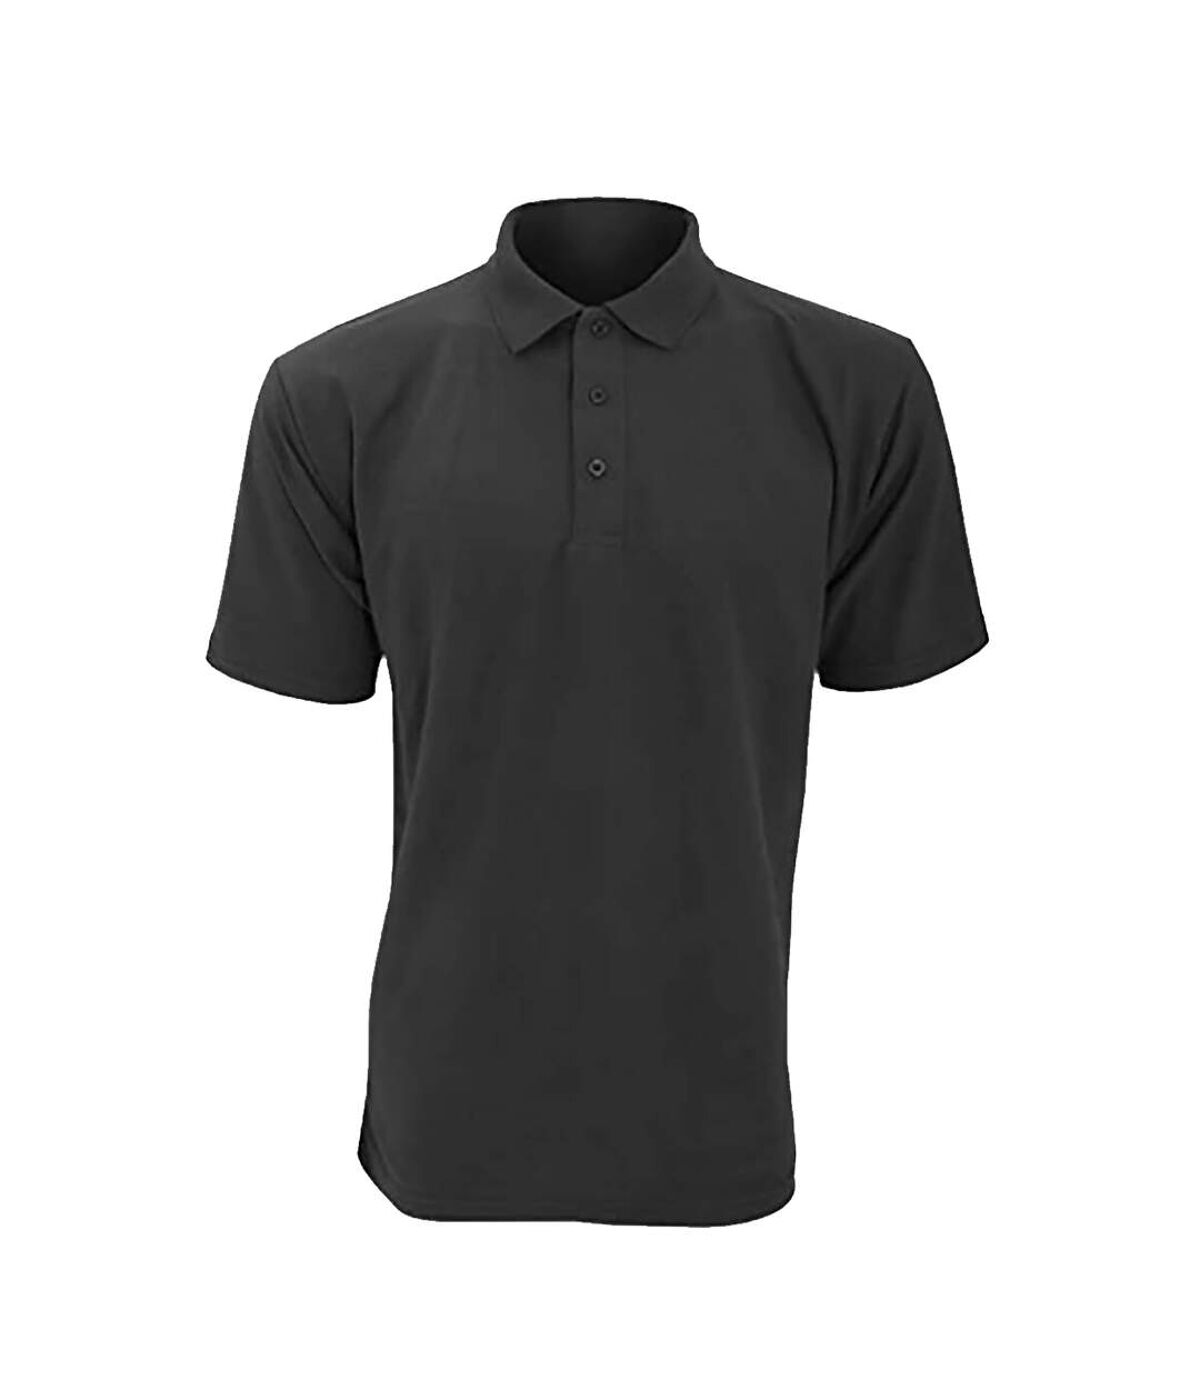 UCC 50/50 Mens Heavyweight Plain Pique Short Sleeve Polo Shirt (Charcoal) - UTBC1195